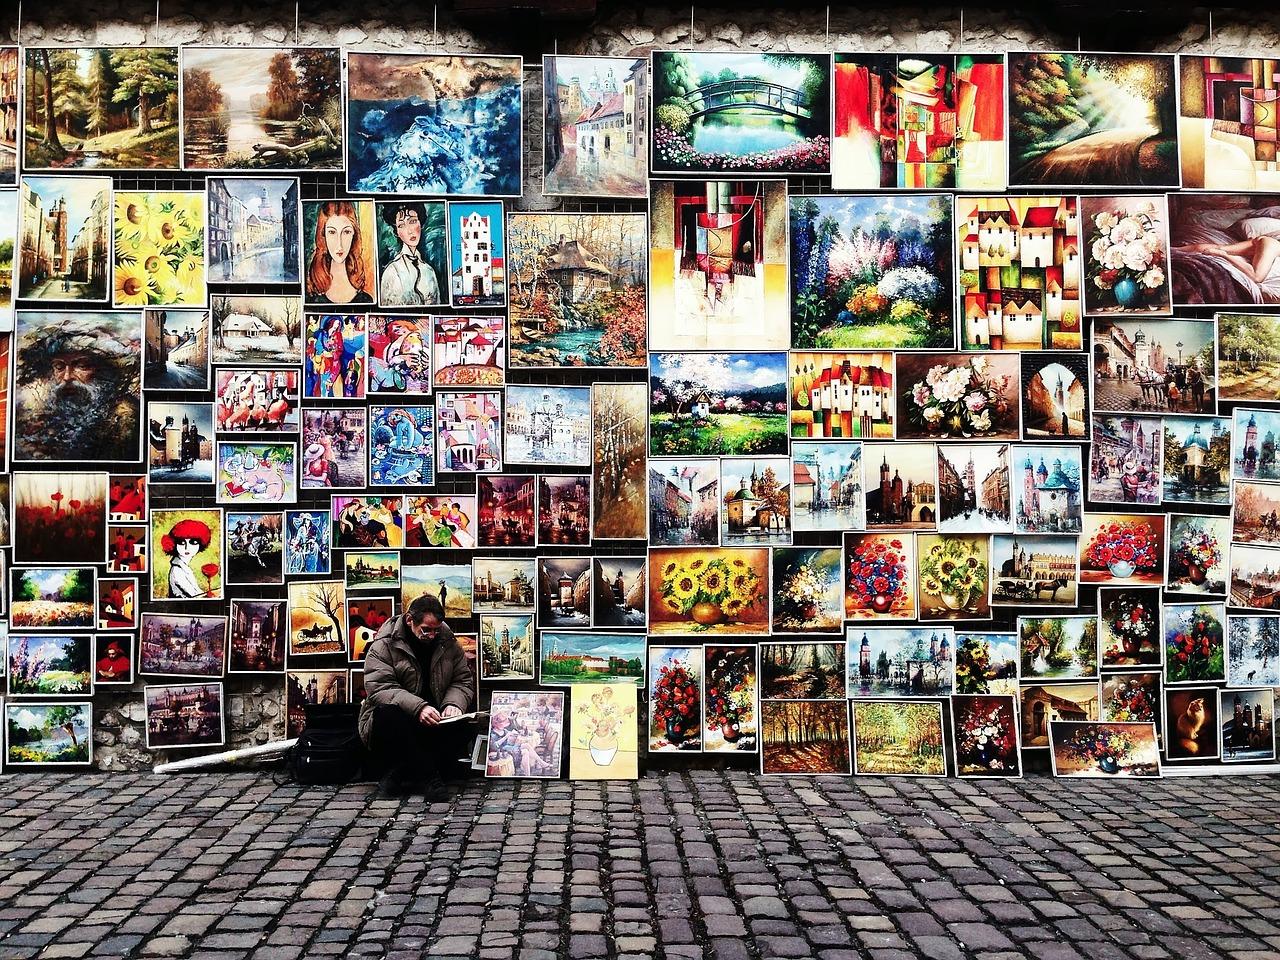 Köp tavlor, oljemålningar, canvastryck, fototapeter, prints, posters eller egna motiv.